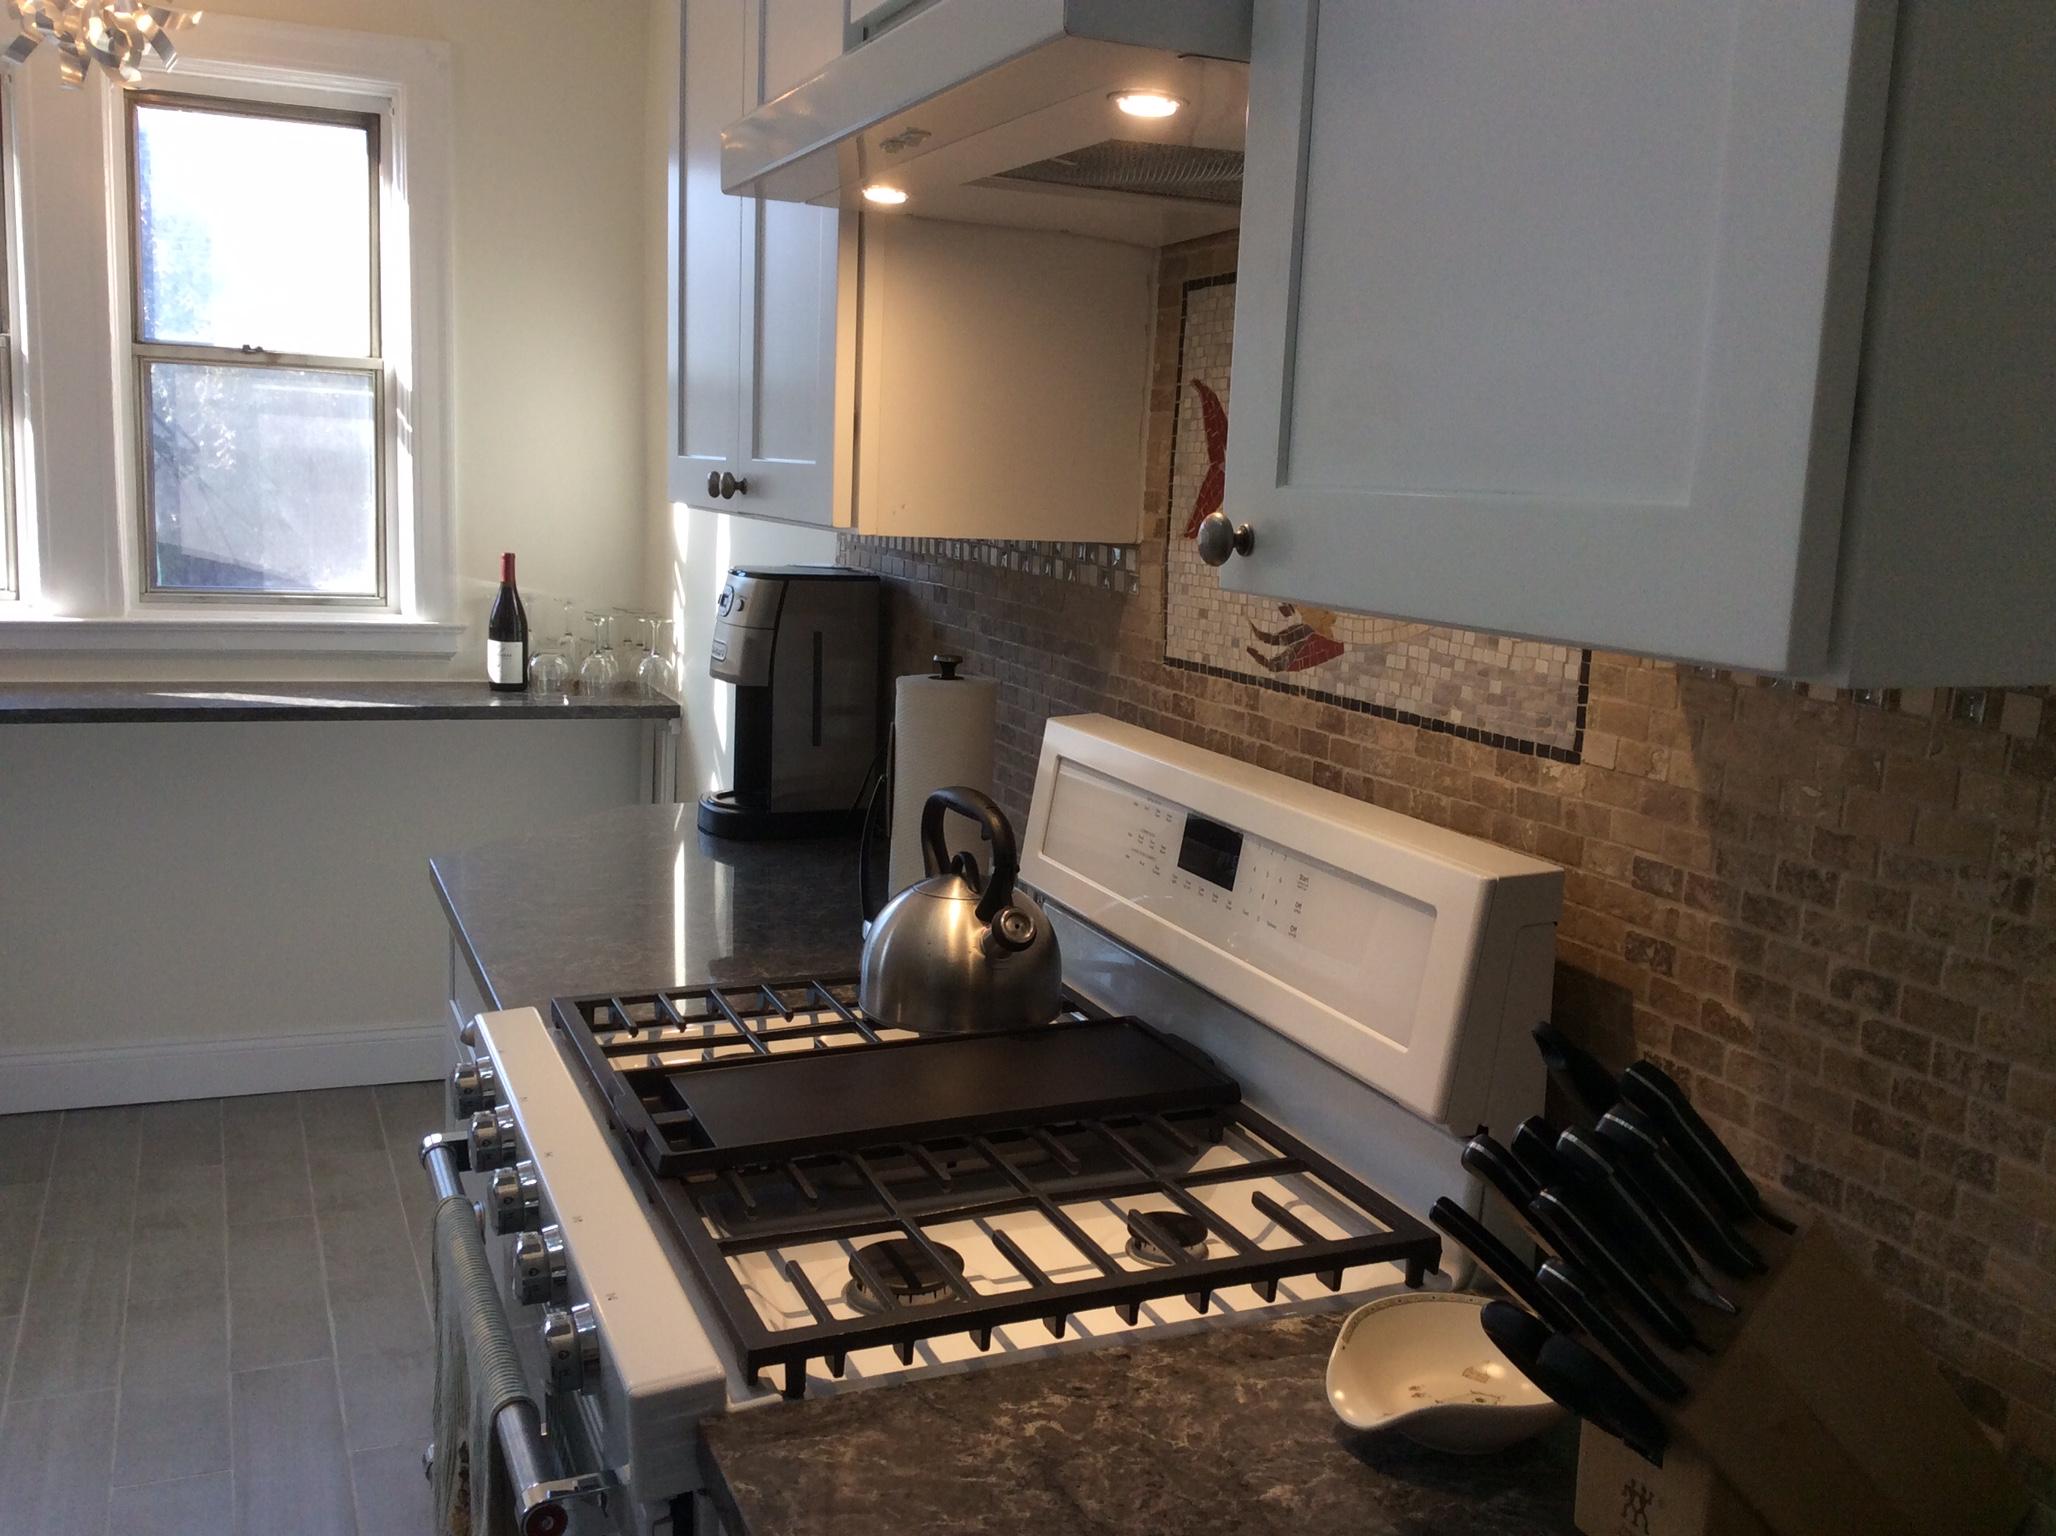 Eli 39 S Painting New York Painting Contractors Kitchen Renovation In Jackson Heights Queens